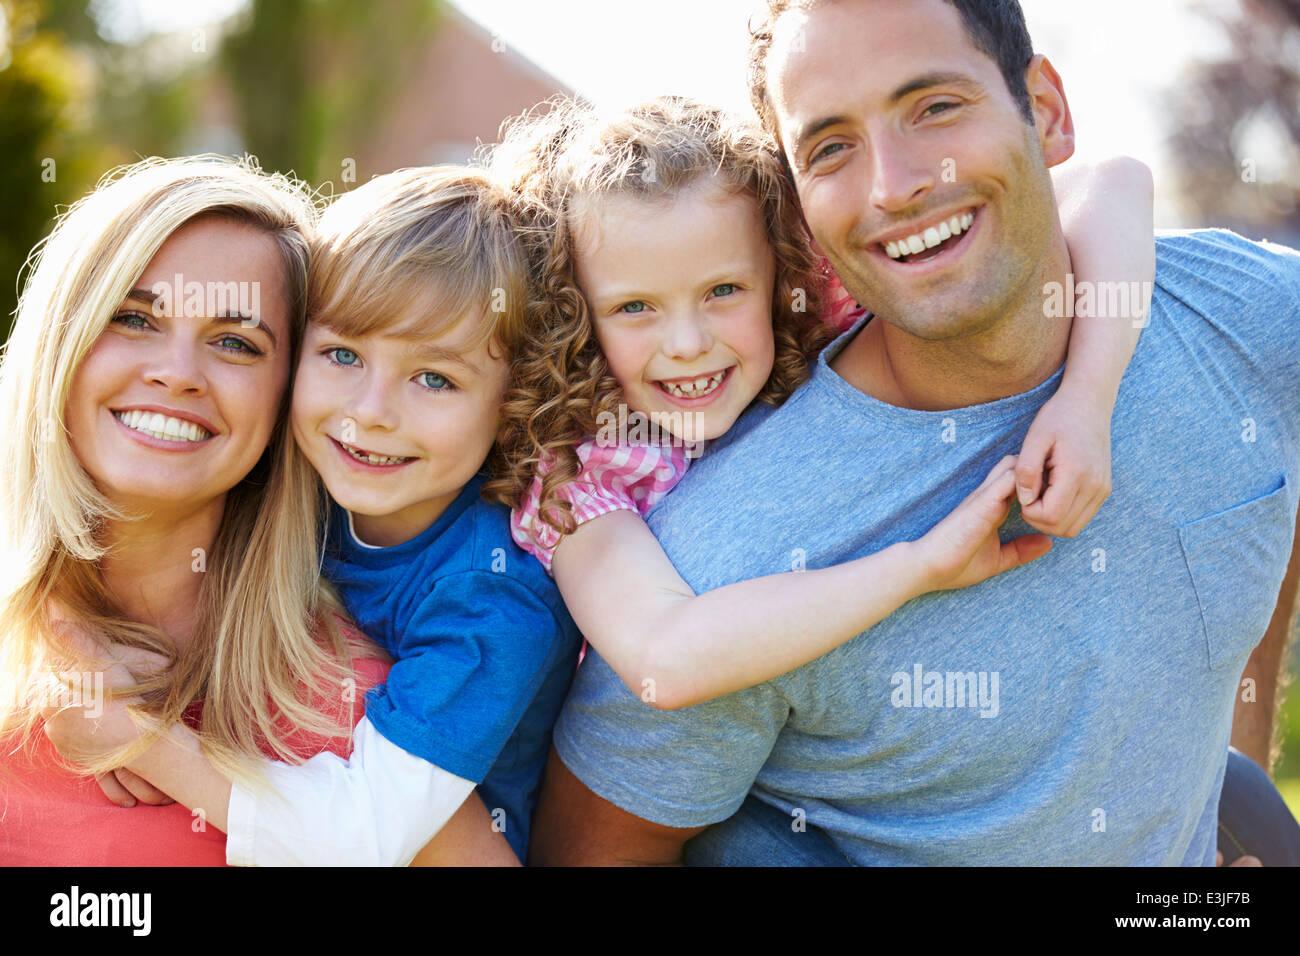 Eltern, Kinder Huckepack-Fahrten im Garten Stockbild